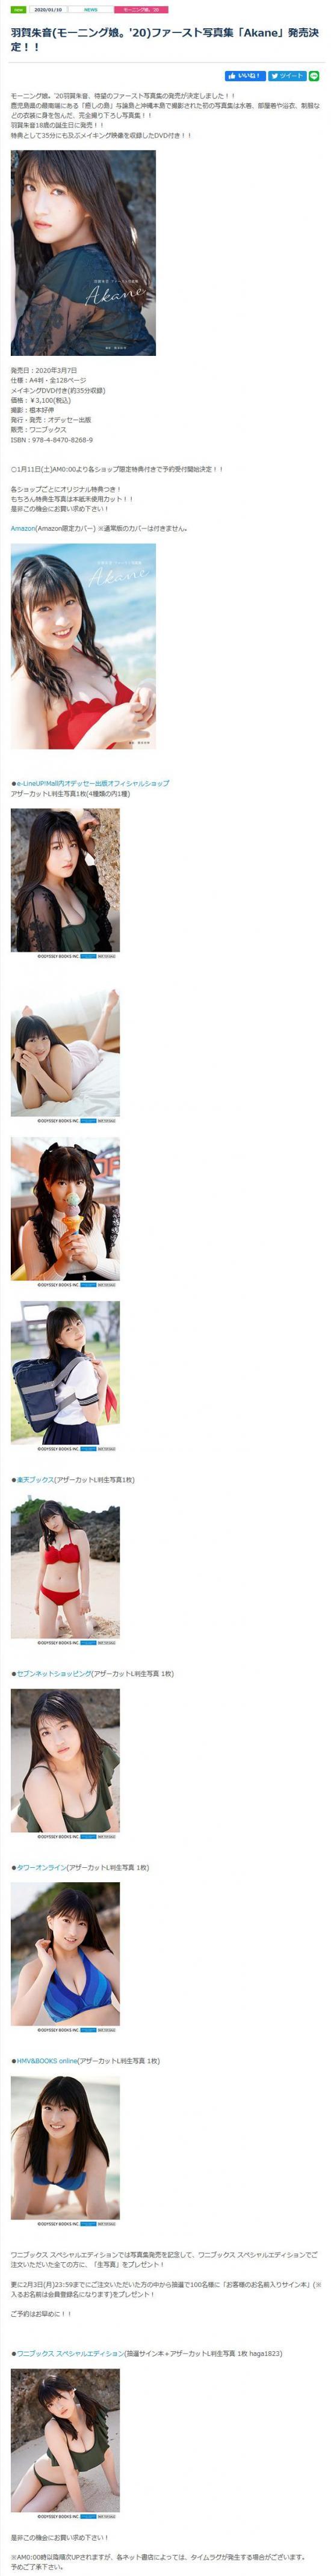 Screenshot_2020-01-10 ニュース詳細|ハロー!プロジェクト オフィシャルサイト.jpg